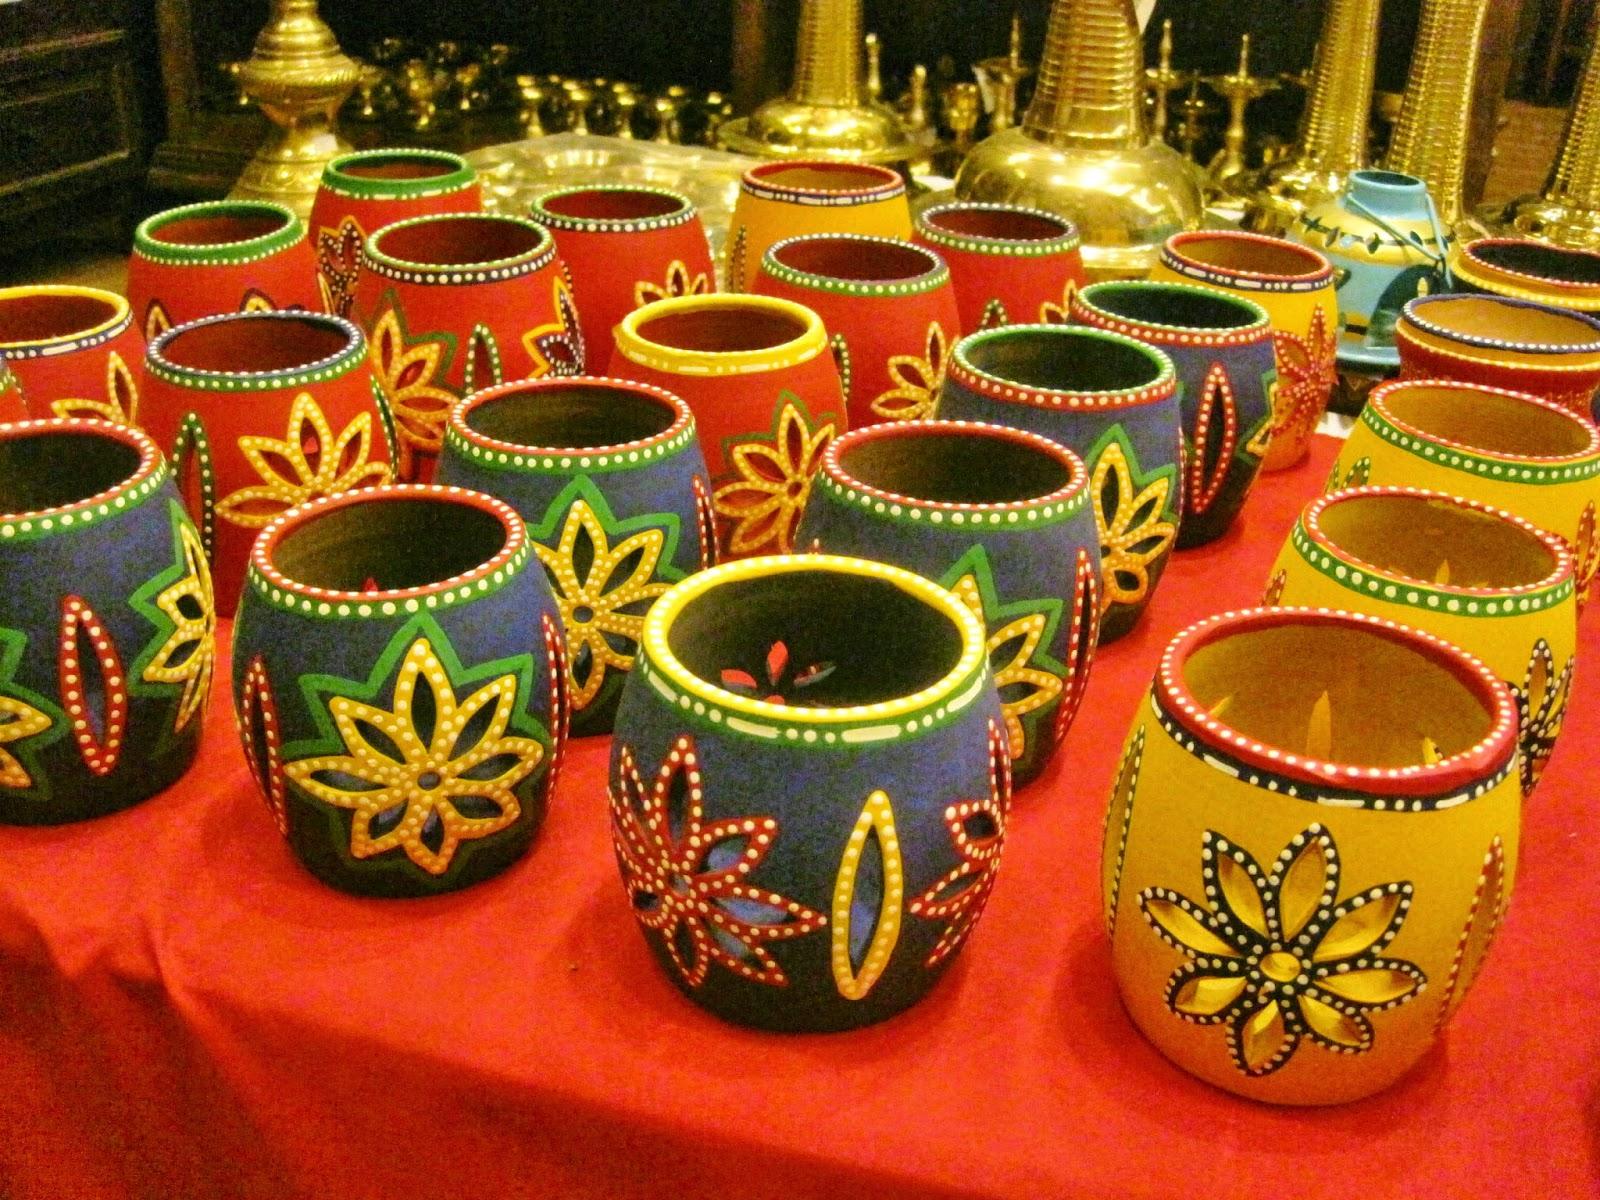 Fish aquarium jayanagar - Candle Holder Made Of Terracota Priced Around Rs 400